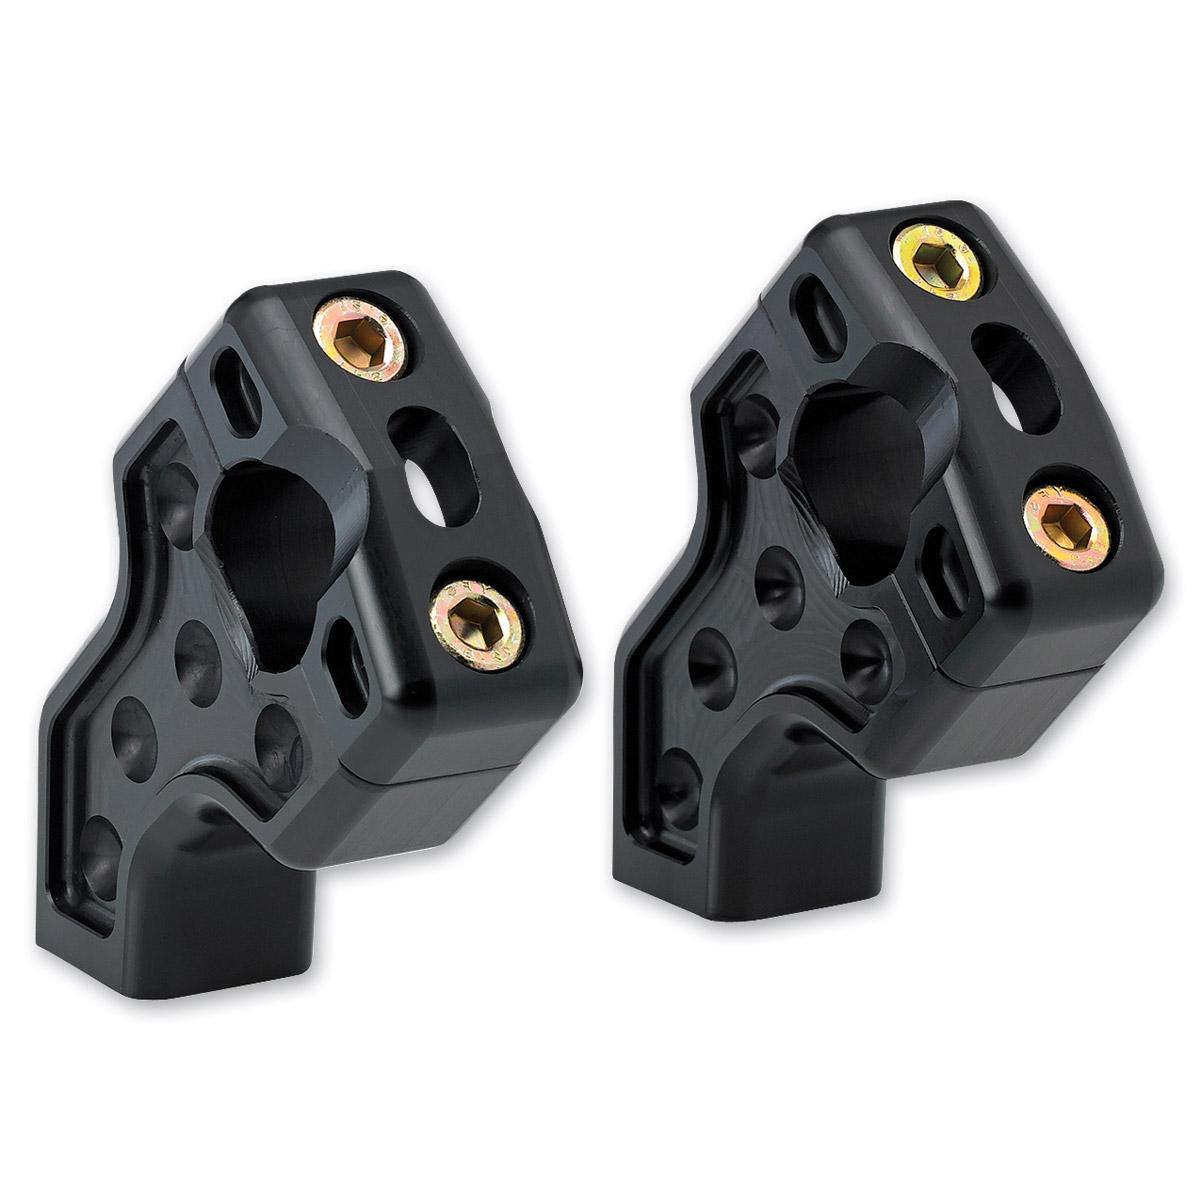 Joker Machine Black Dual Pullback Handlebar Risers - 03-866B